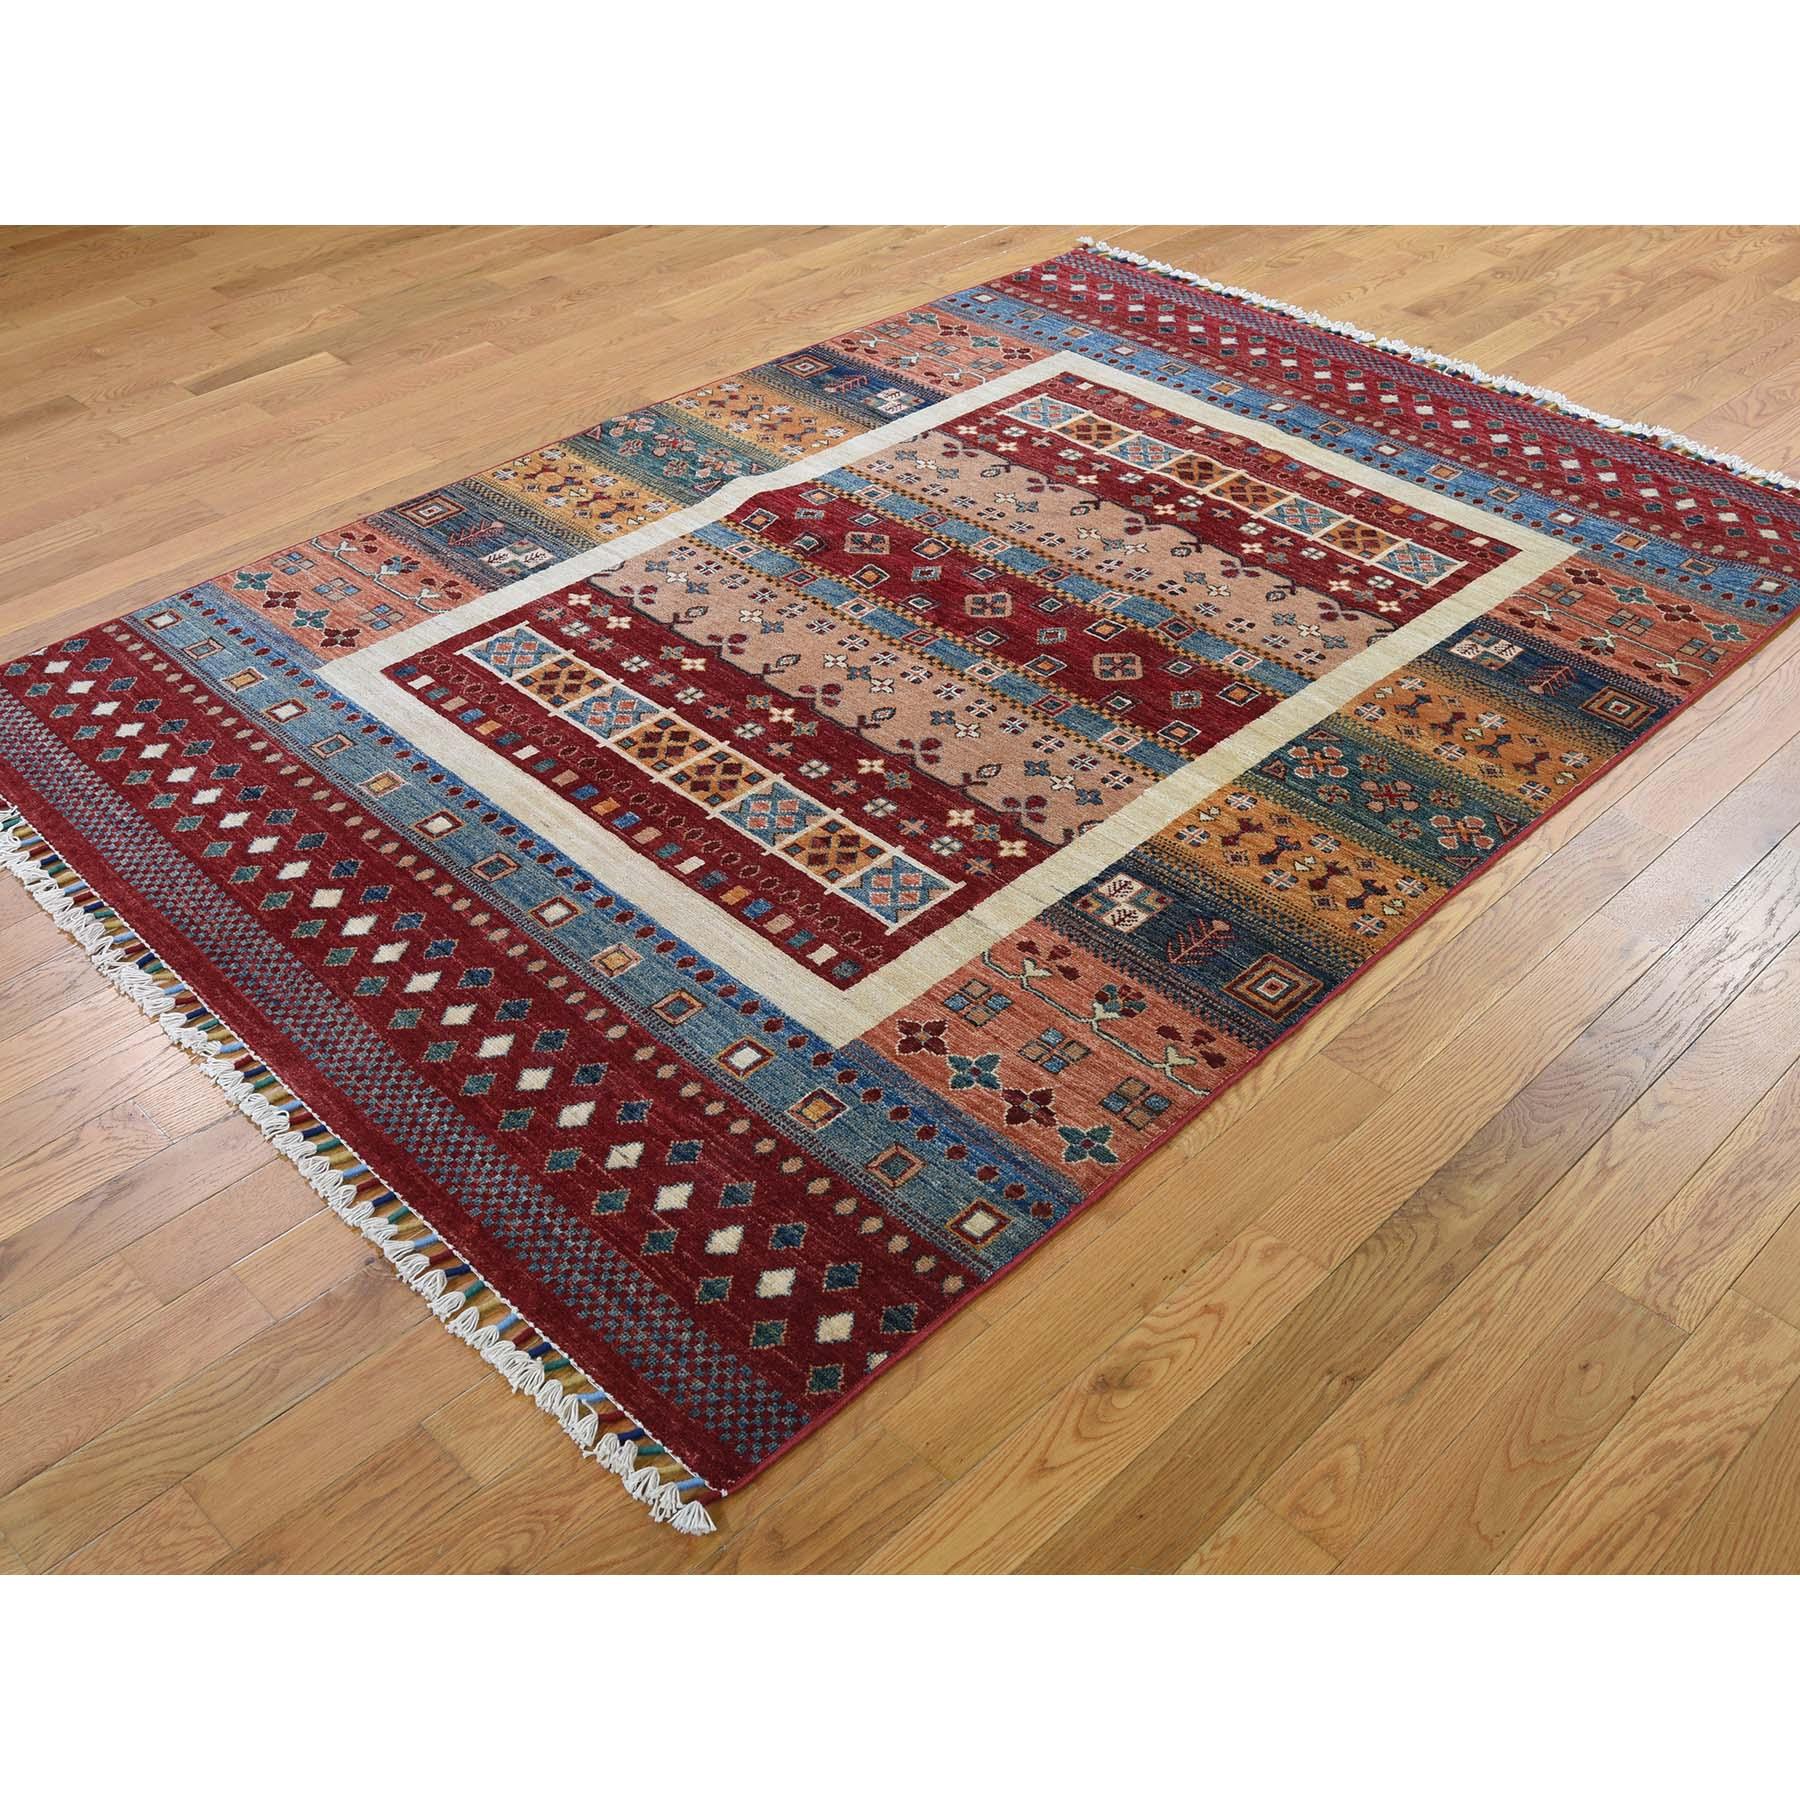 5-x7- Super Kazak Khorjin Design Hand-Knotted Pure Wool Oriental Rug